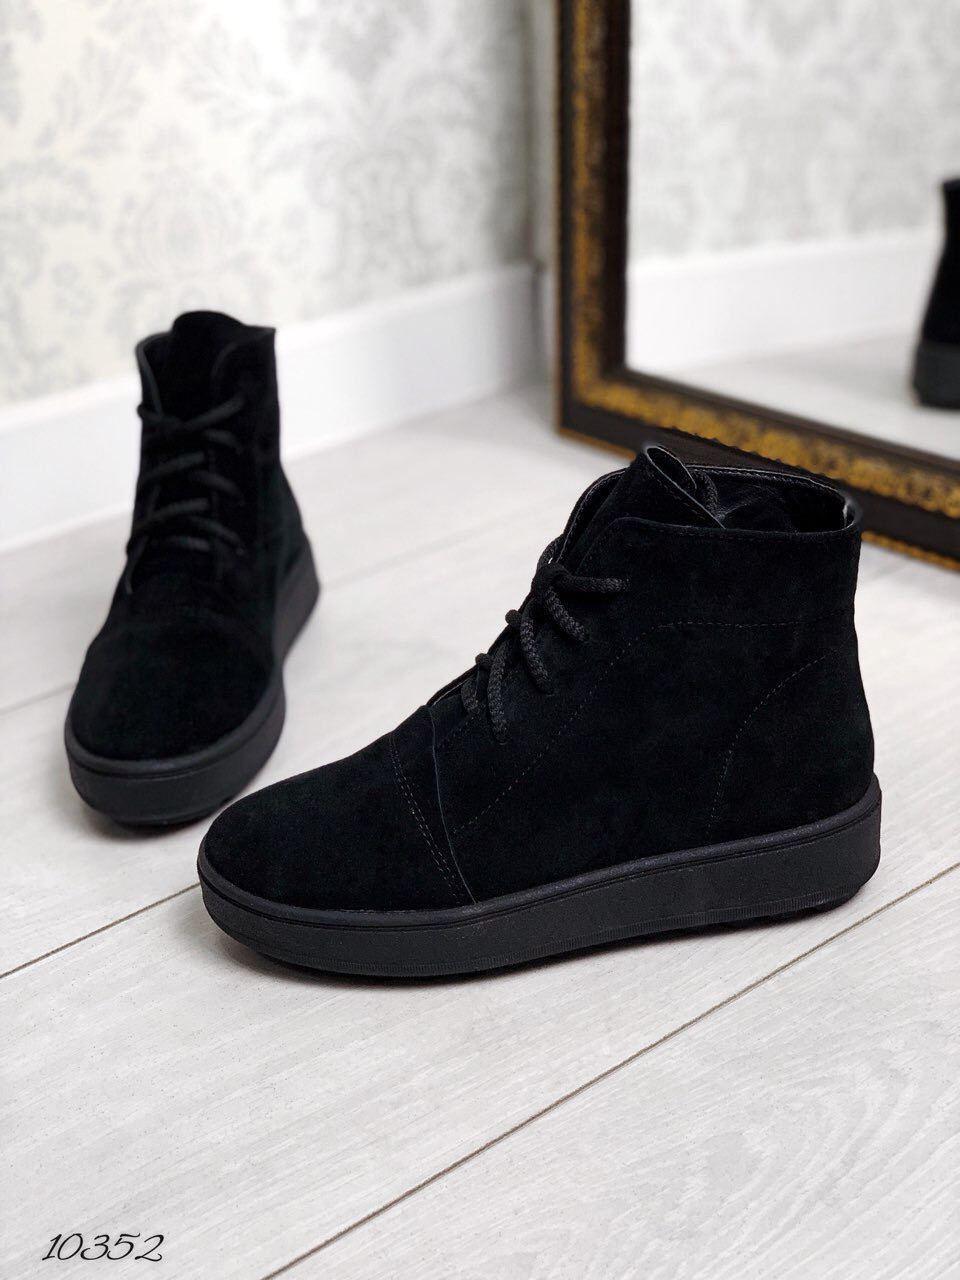 Ботинки зима замш классика на шнурках В наличии и под заказ